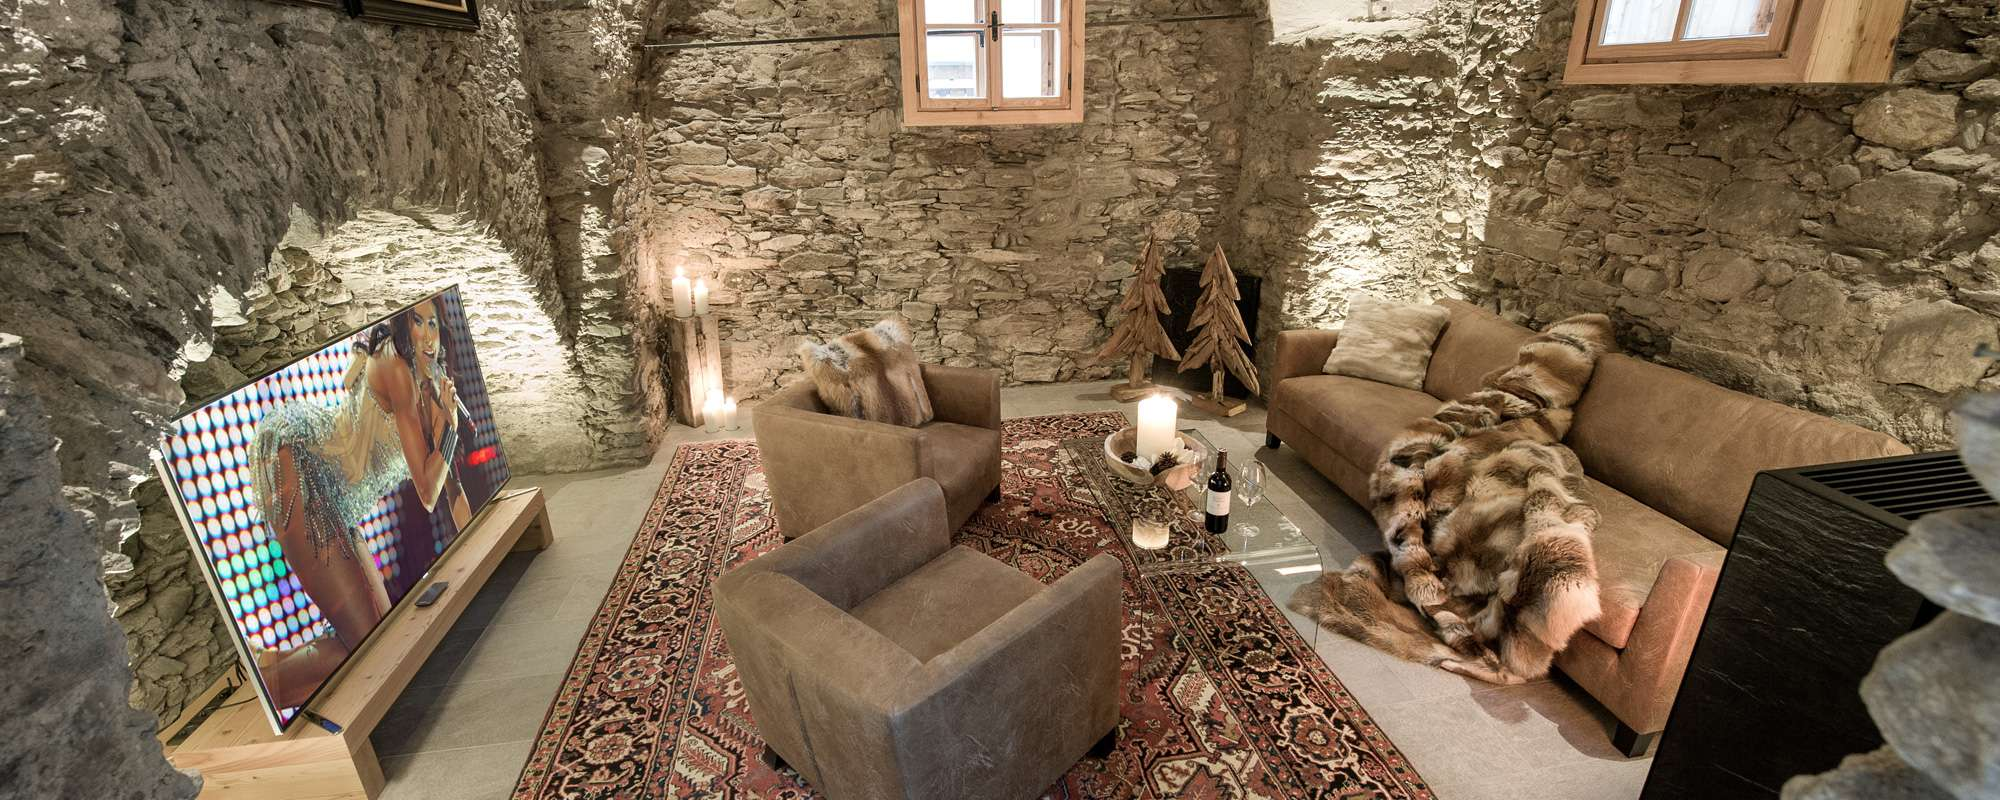 Tower suite - exklusive experience in Bad Hofgastein